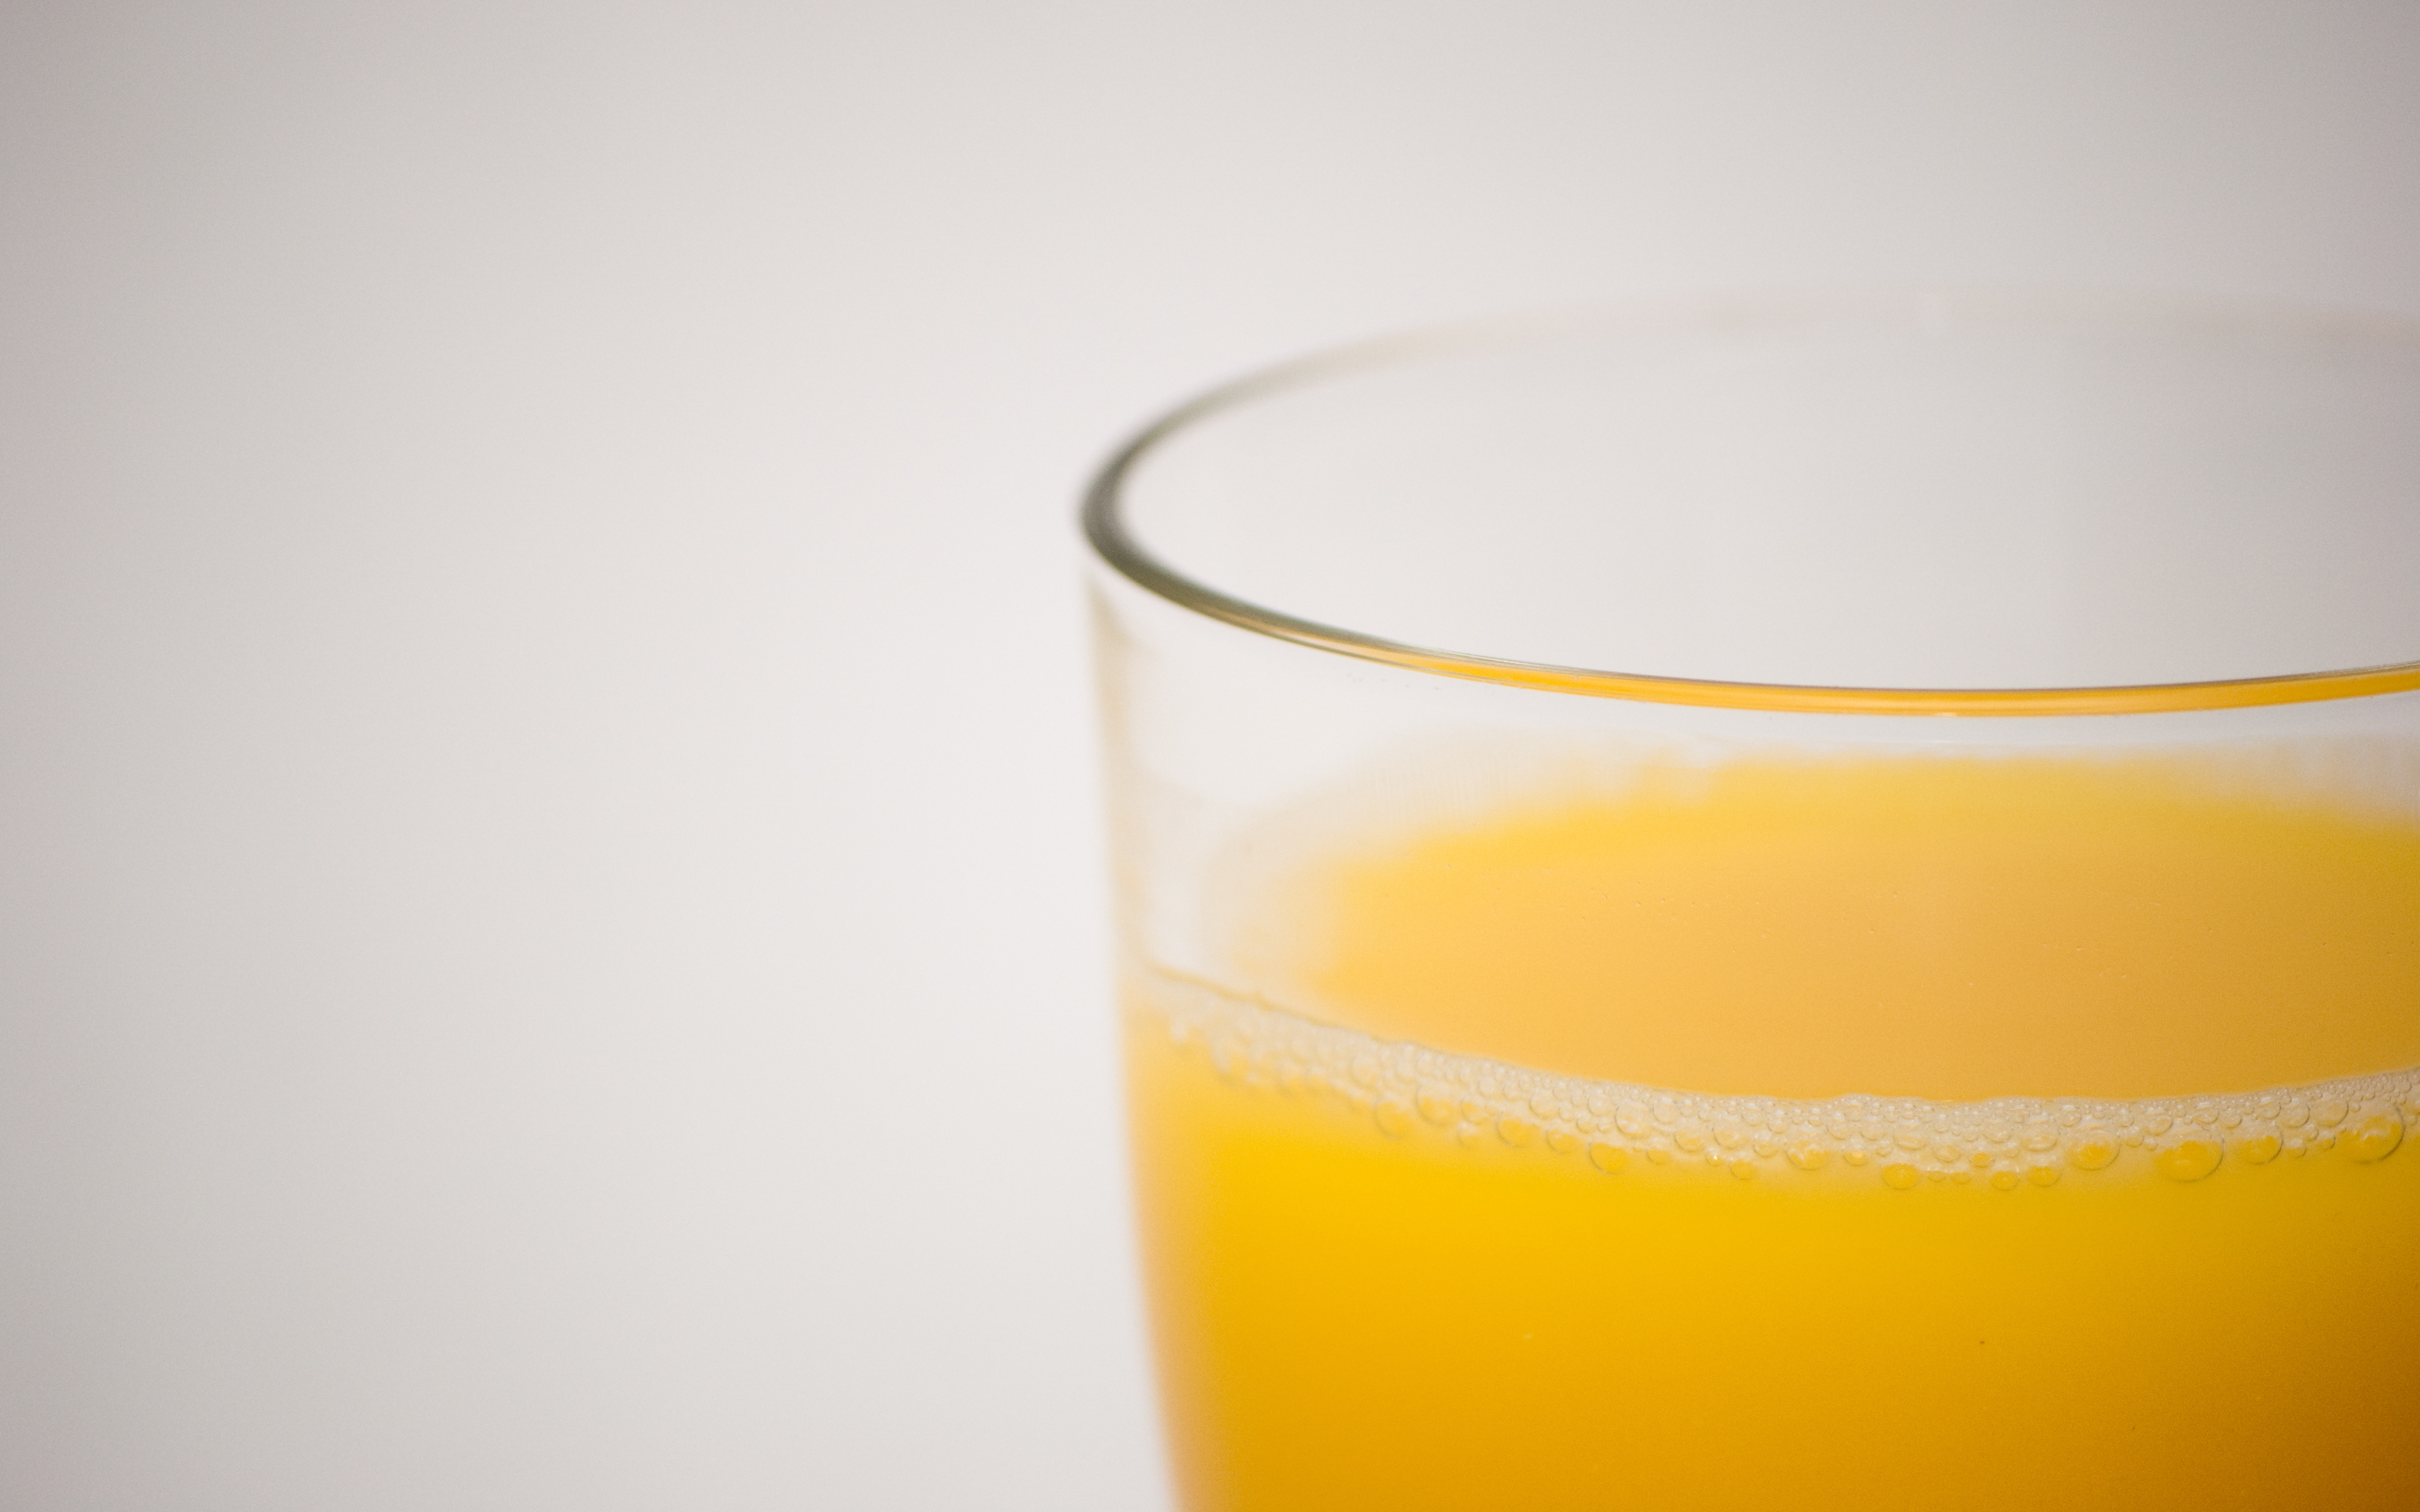 Orange Juice Wallpaper Background 29790 3872x2420